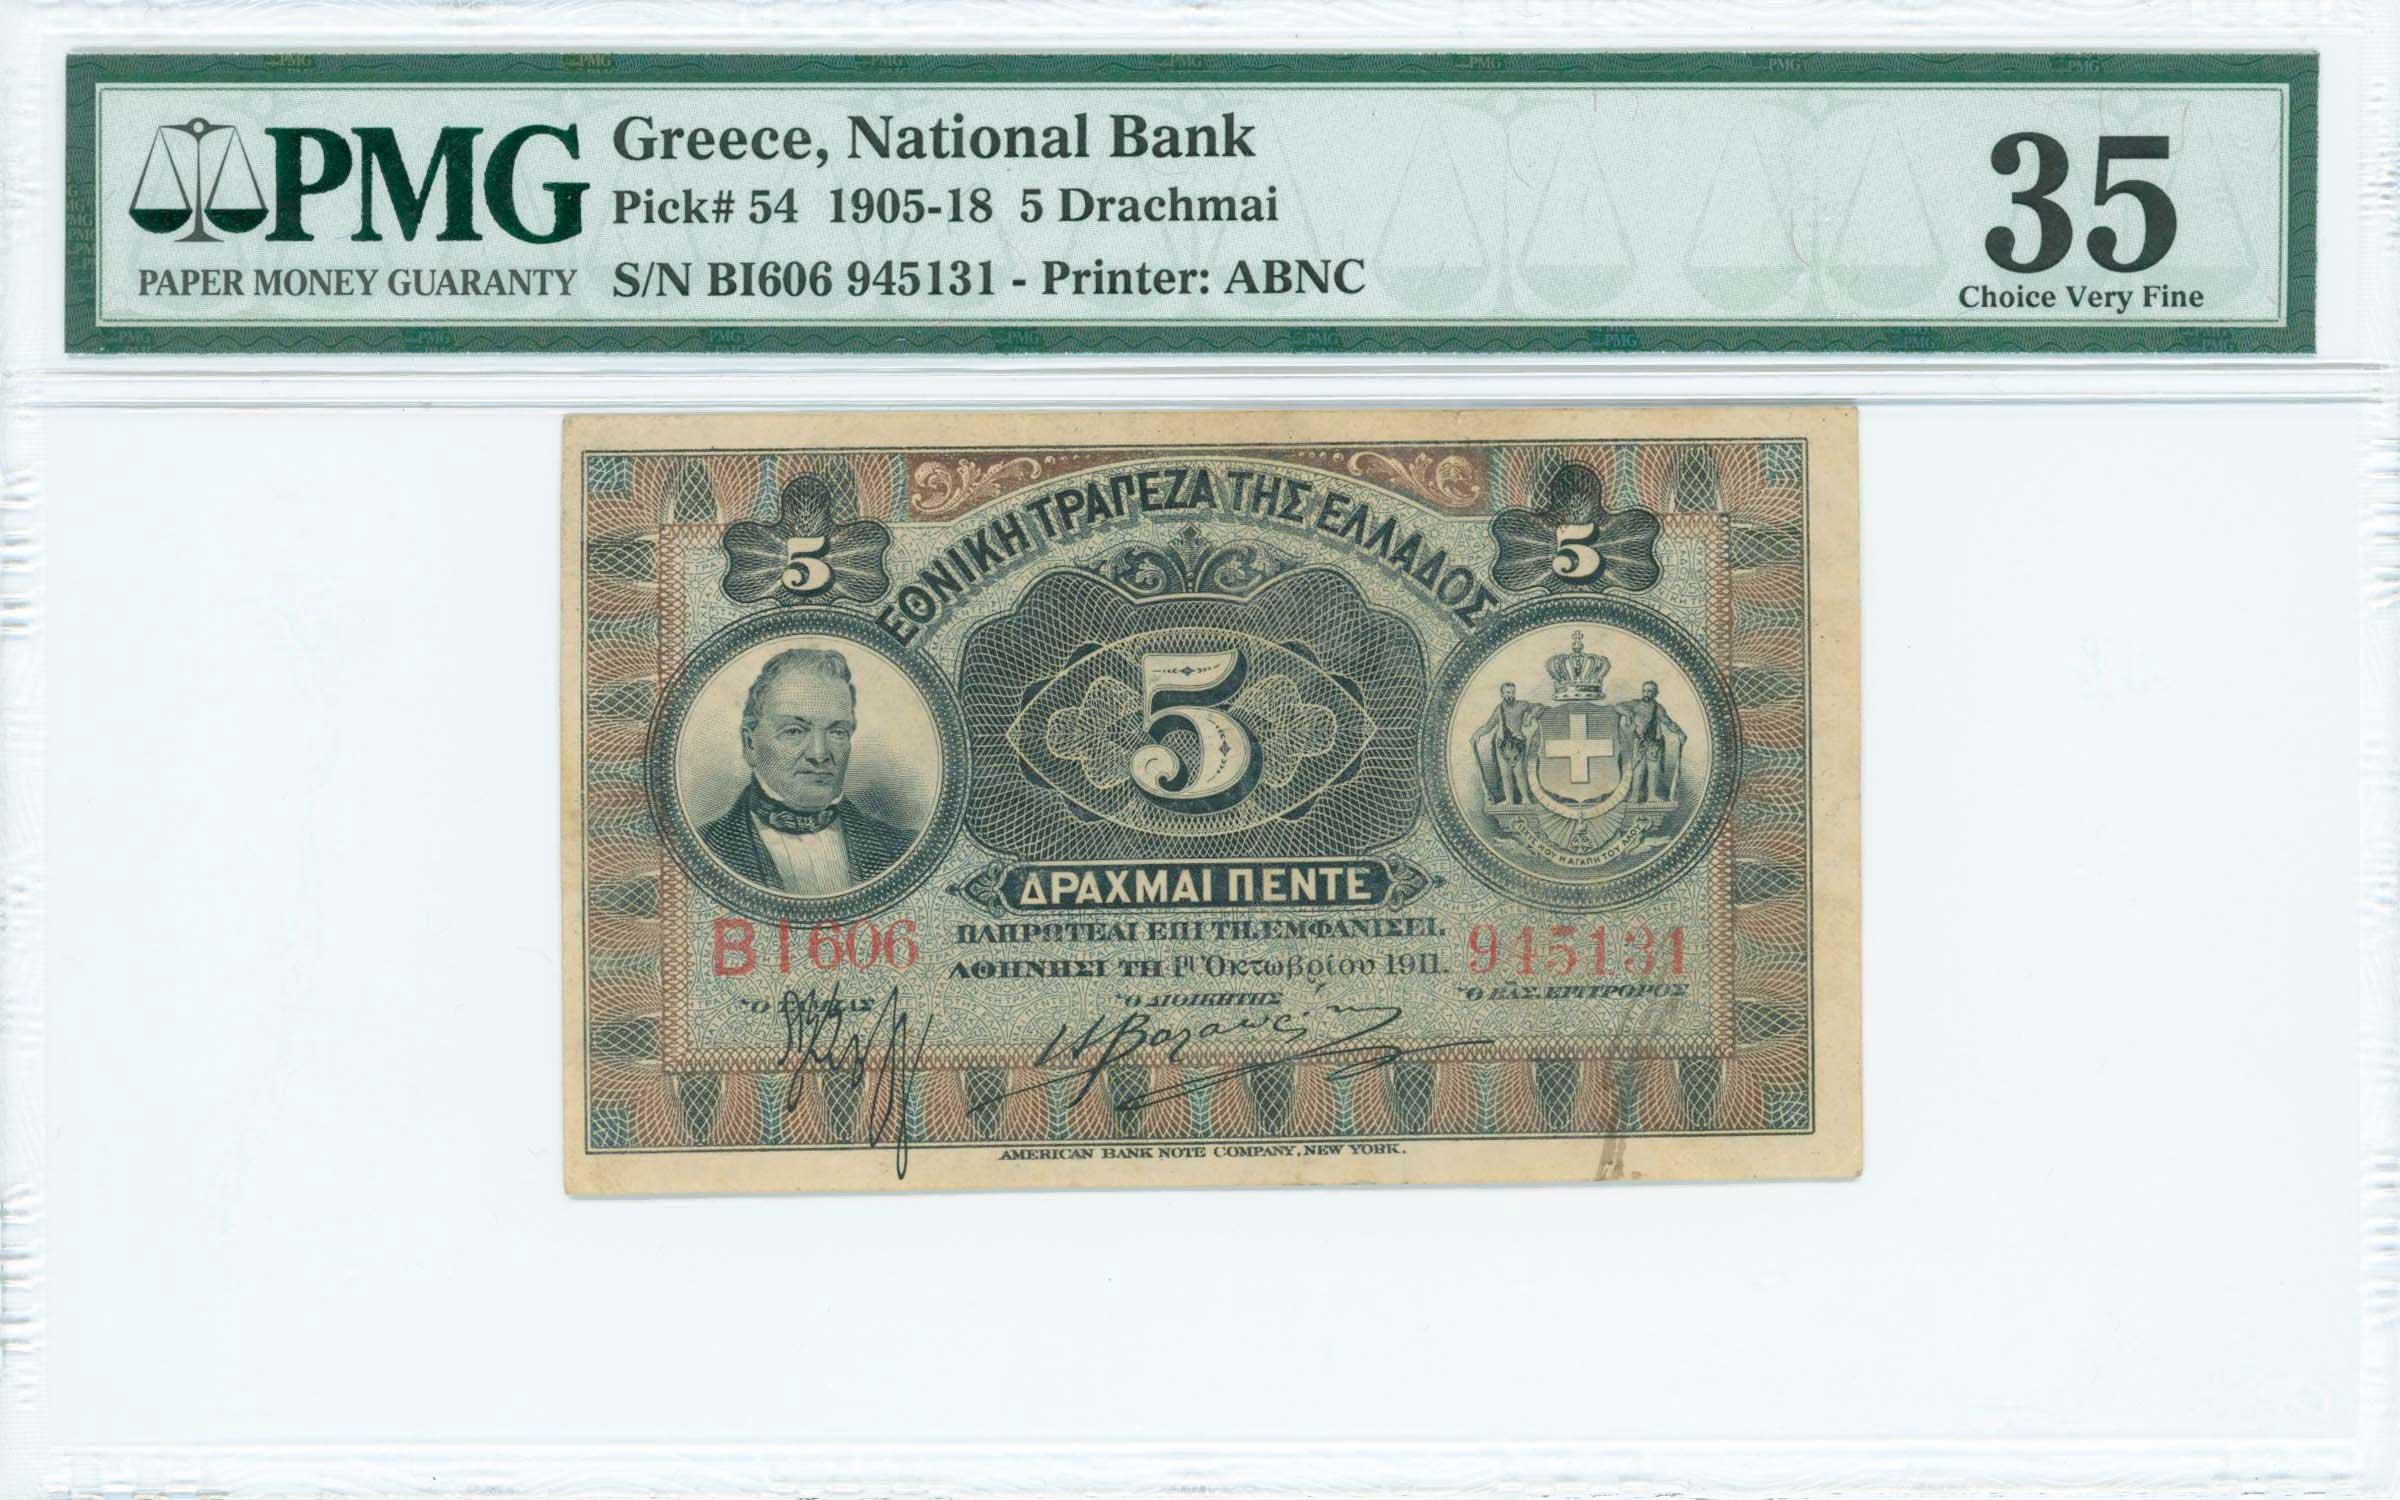 Lot 8433 - -  PAPER MONEY - BANKNOTES National Bank of Greece -  A. Karamitsos Public & Live Bid Auction 644 Coins, Medals & Banknotes